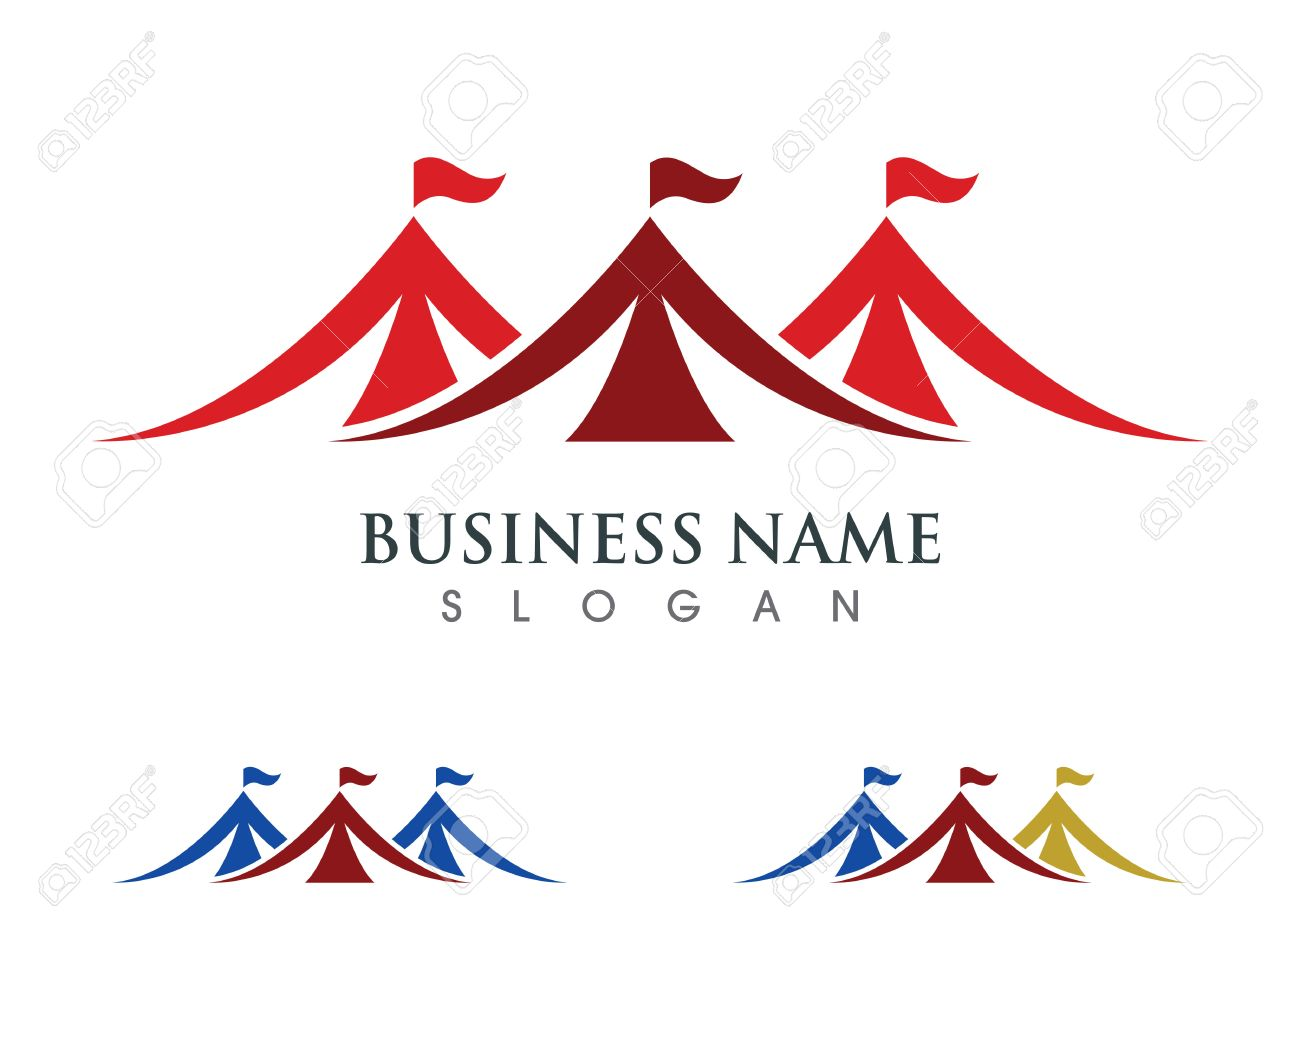 Circus tent logo template. Vector illustration.v - 72755698